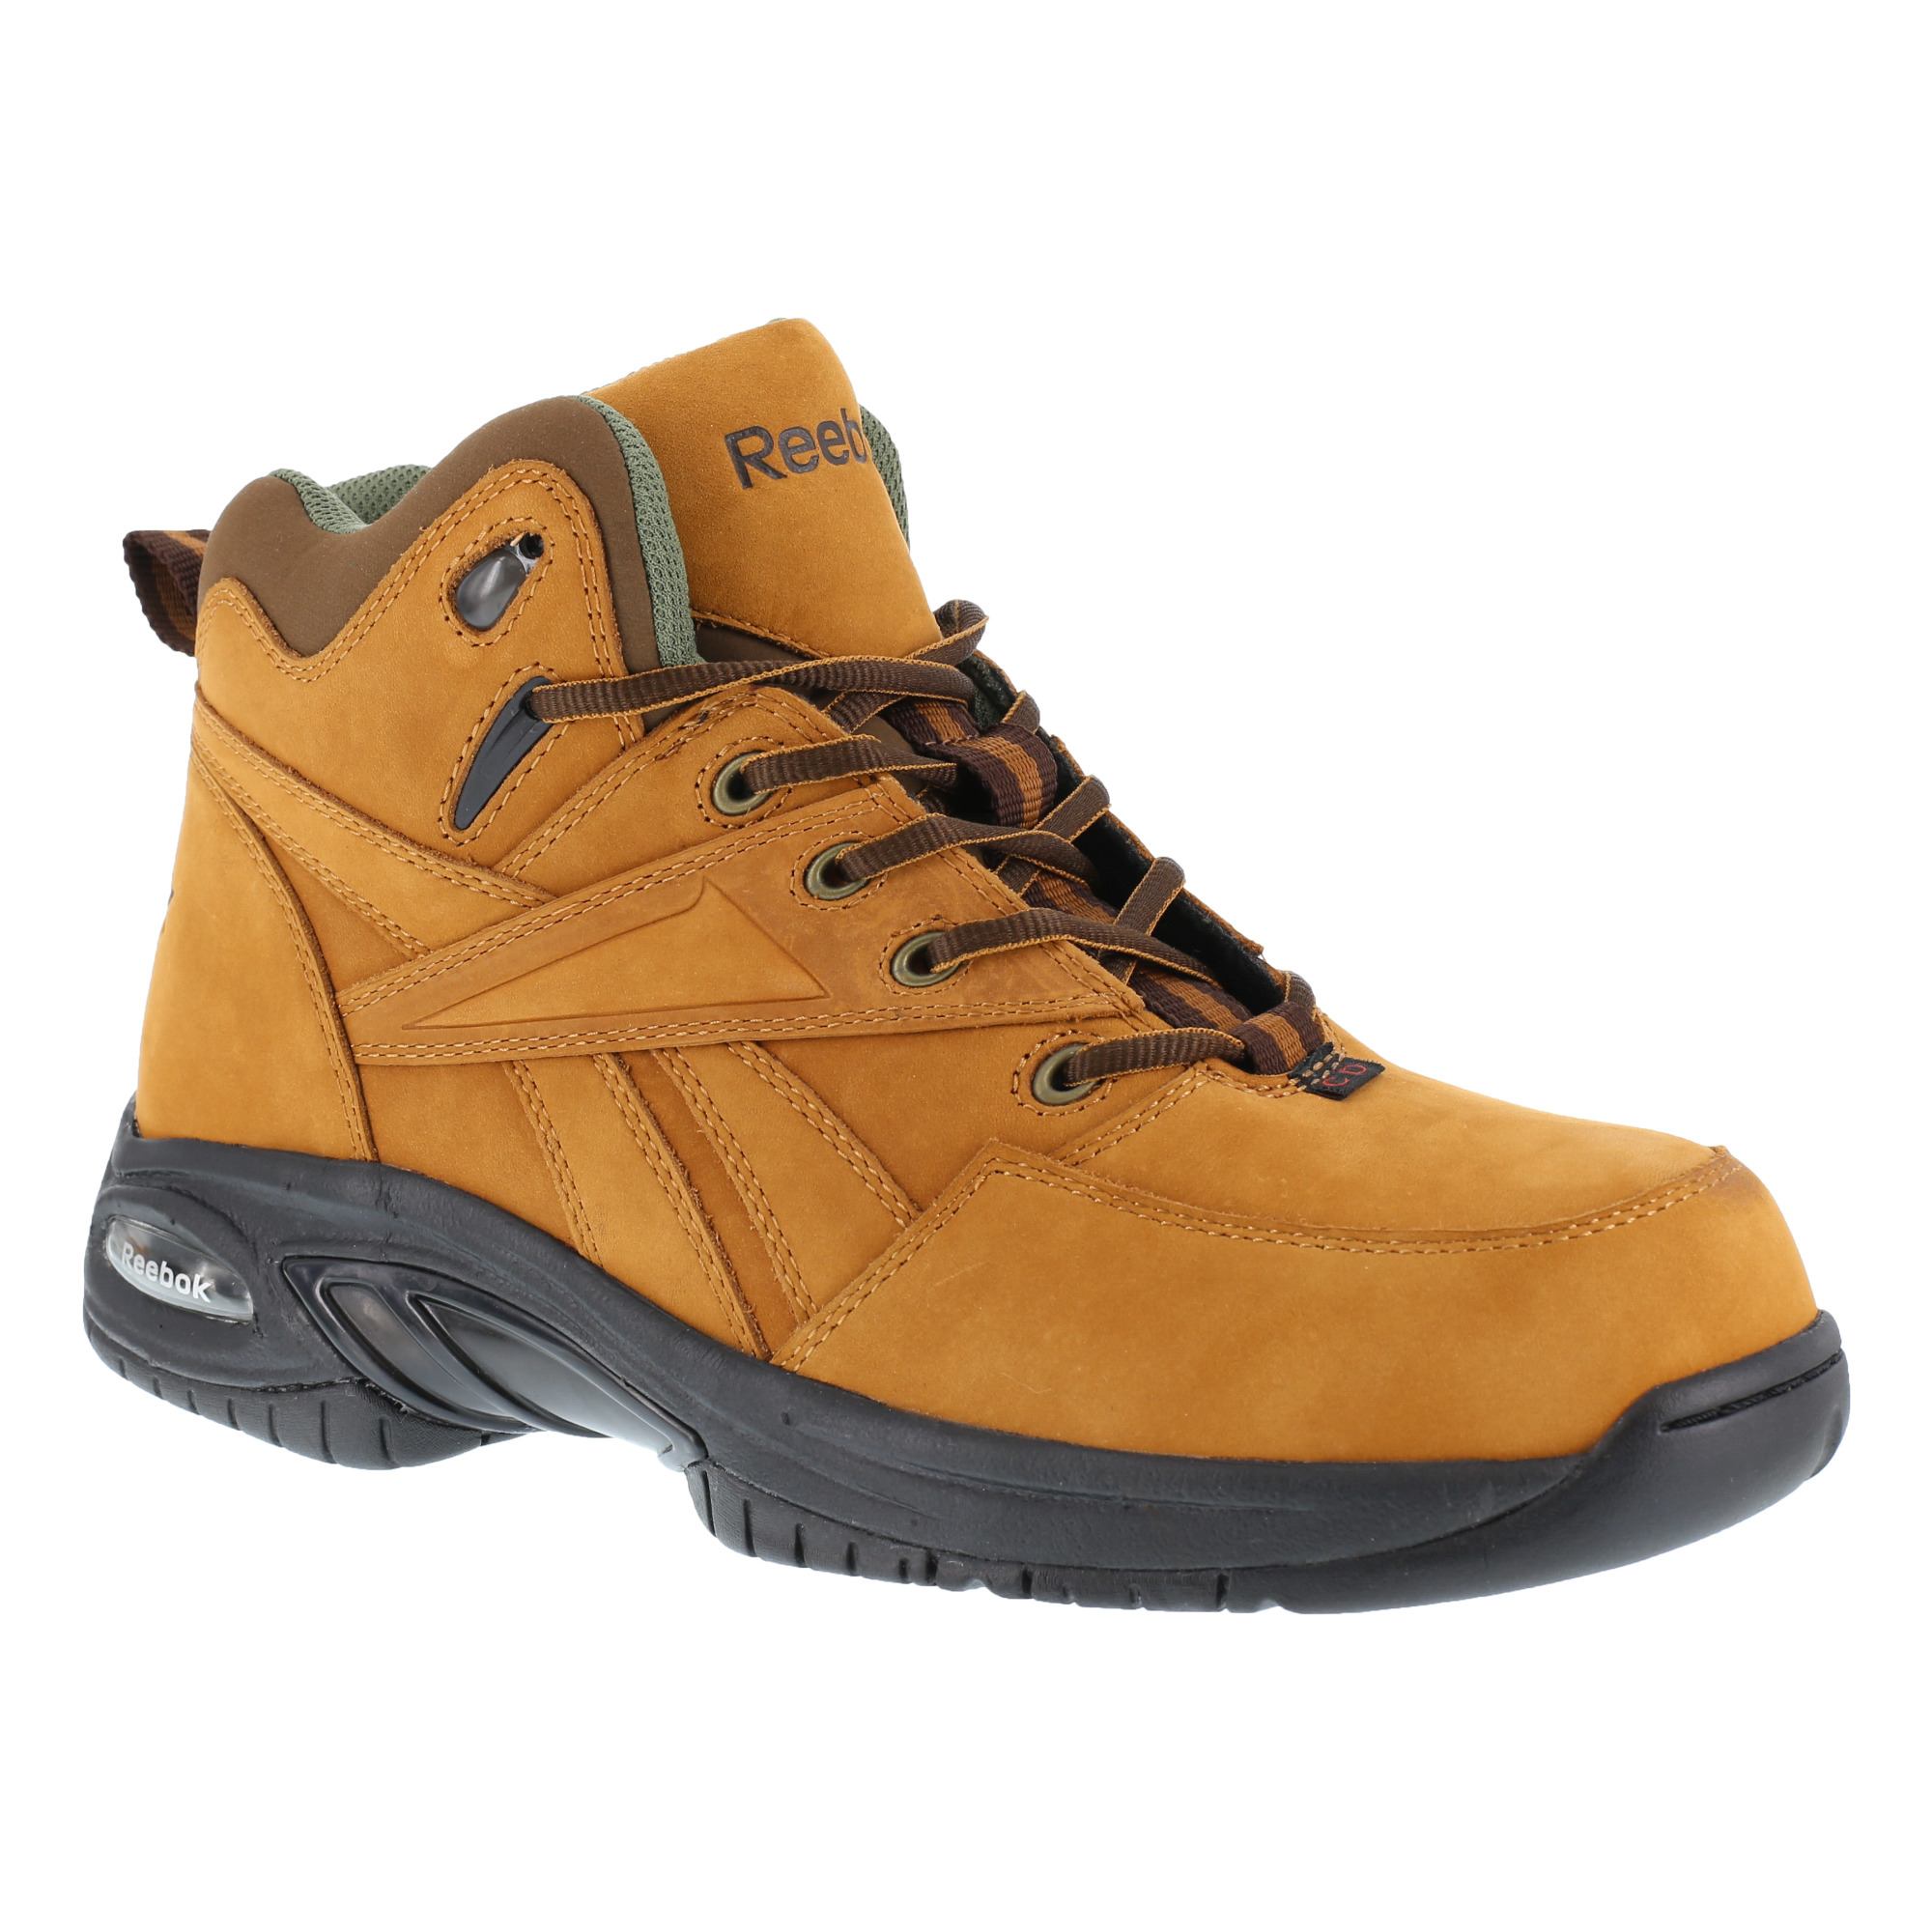 reebok mens golden leather hiker boots tyak composite toe